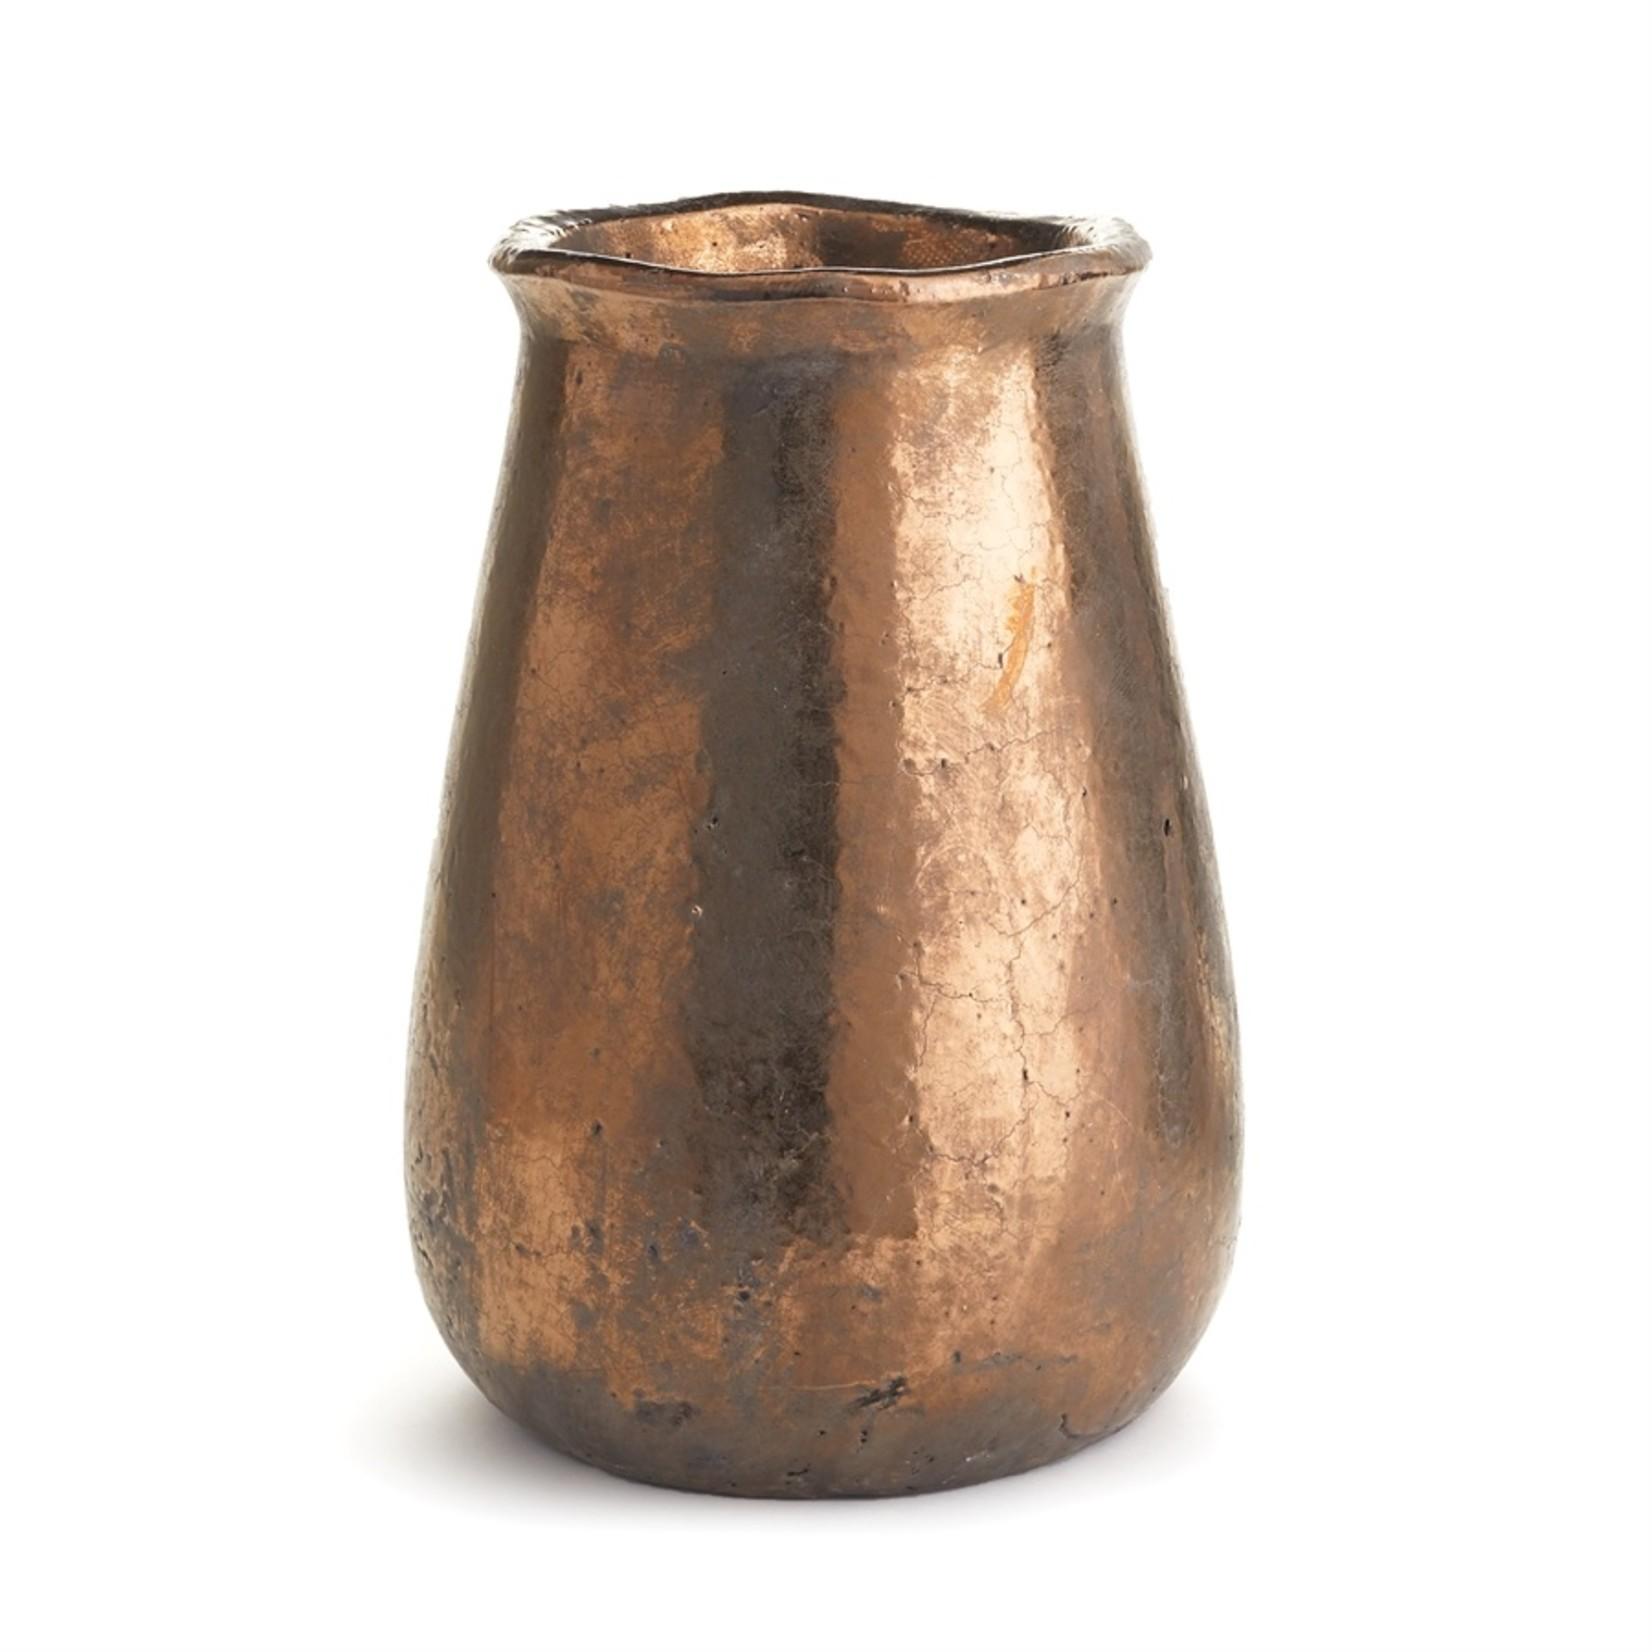 Napa Home and Garden Peyton Vase